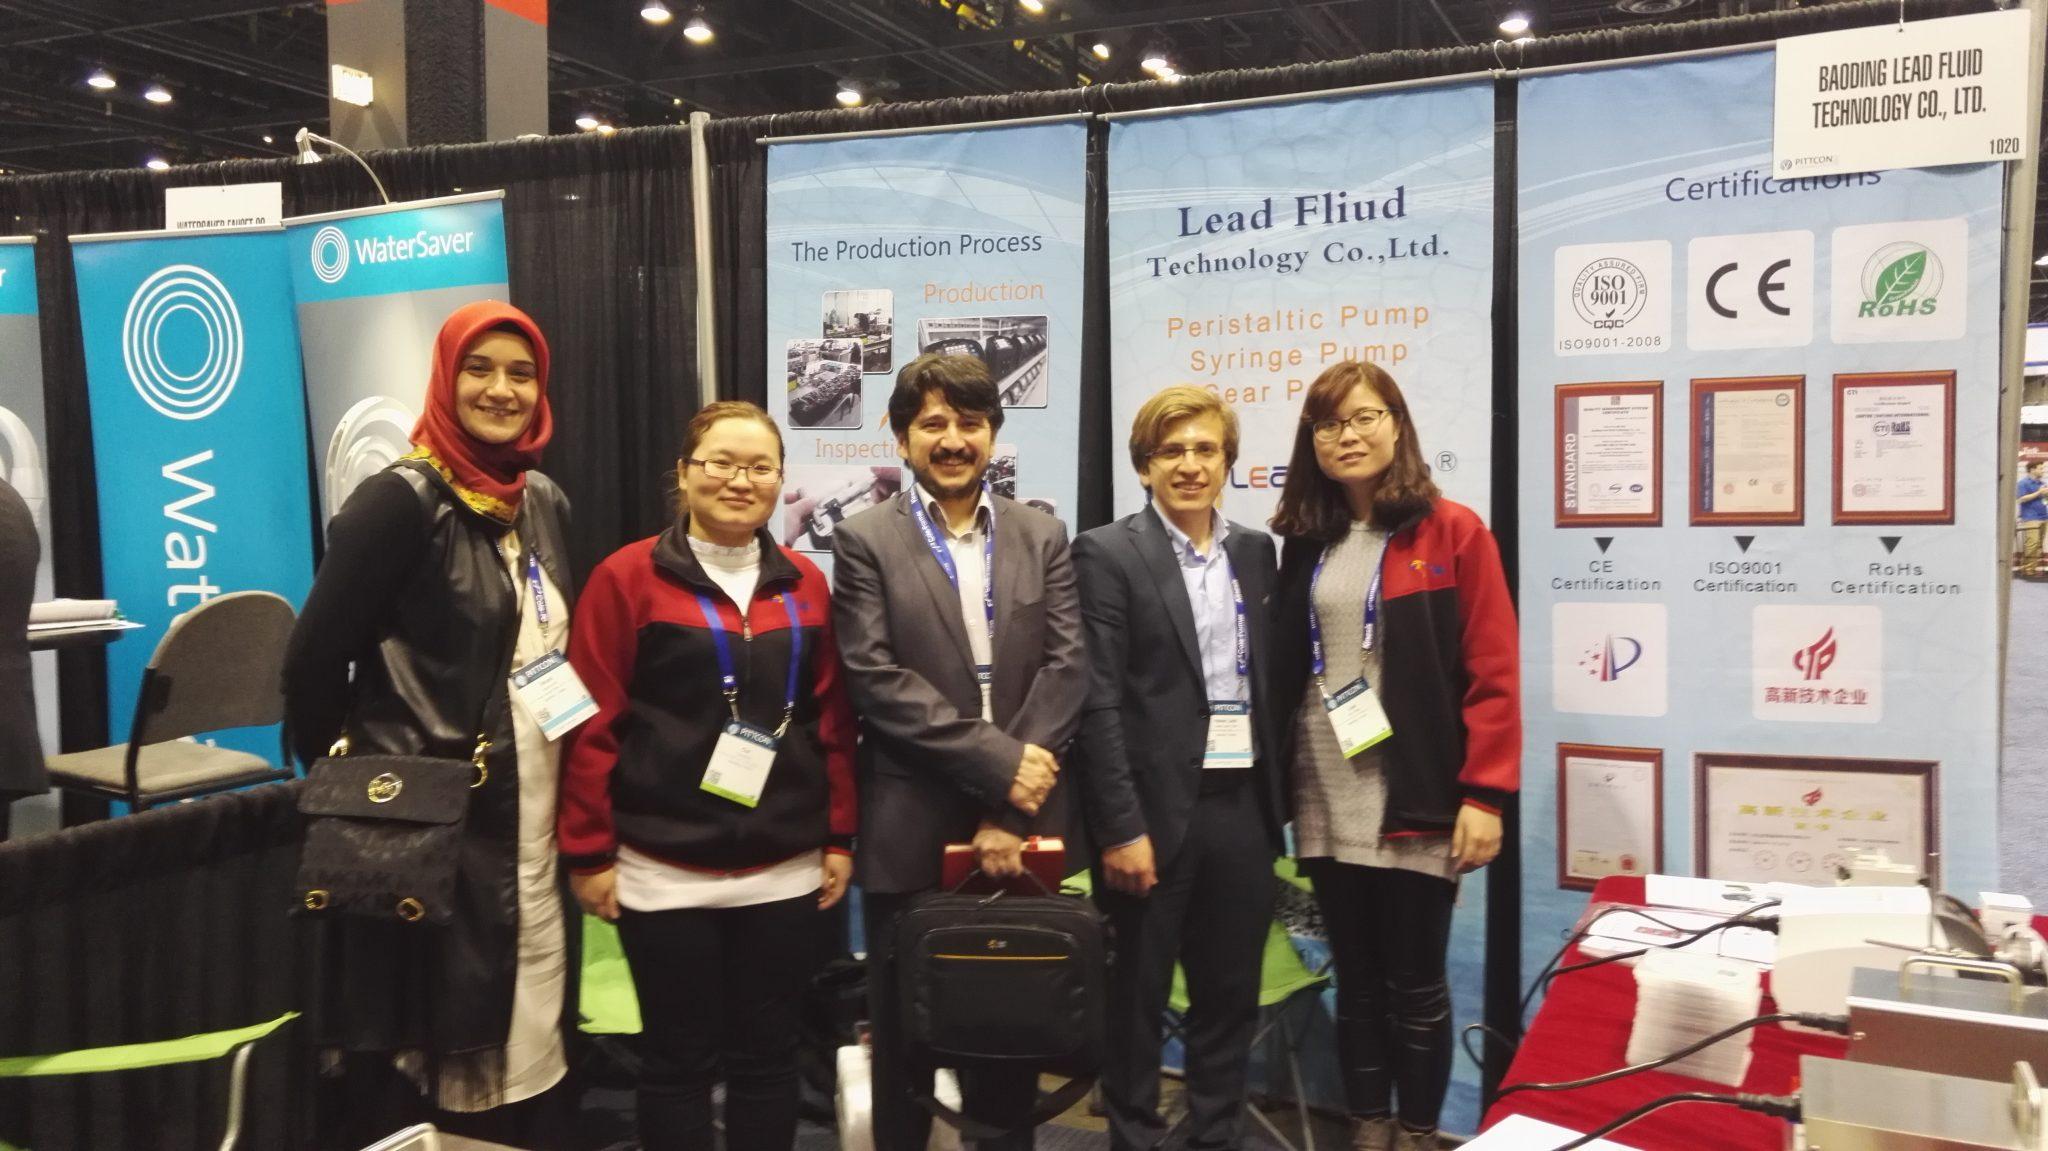 Lead Fluid - SCI PITTCON 2017 Meeting